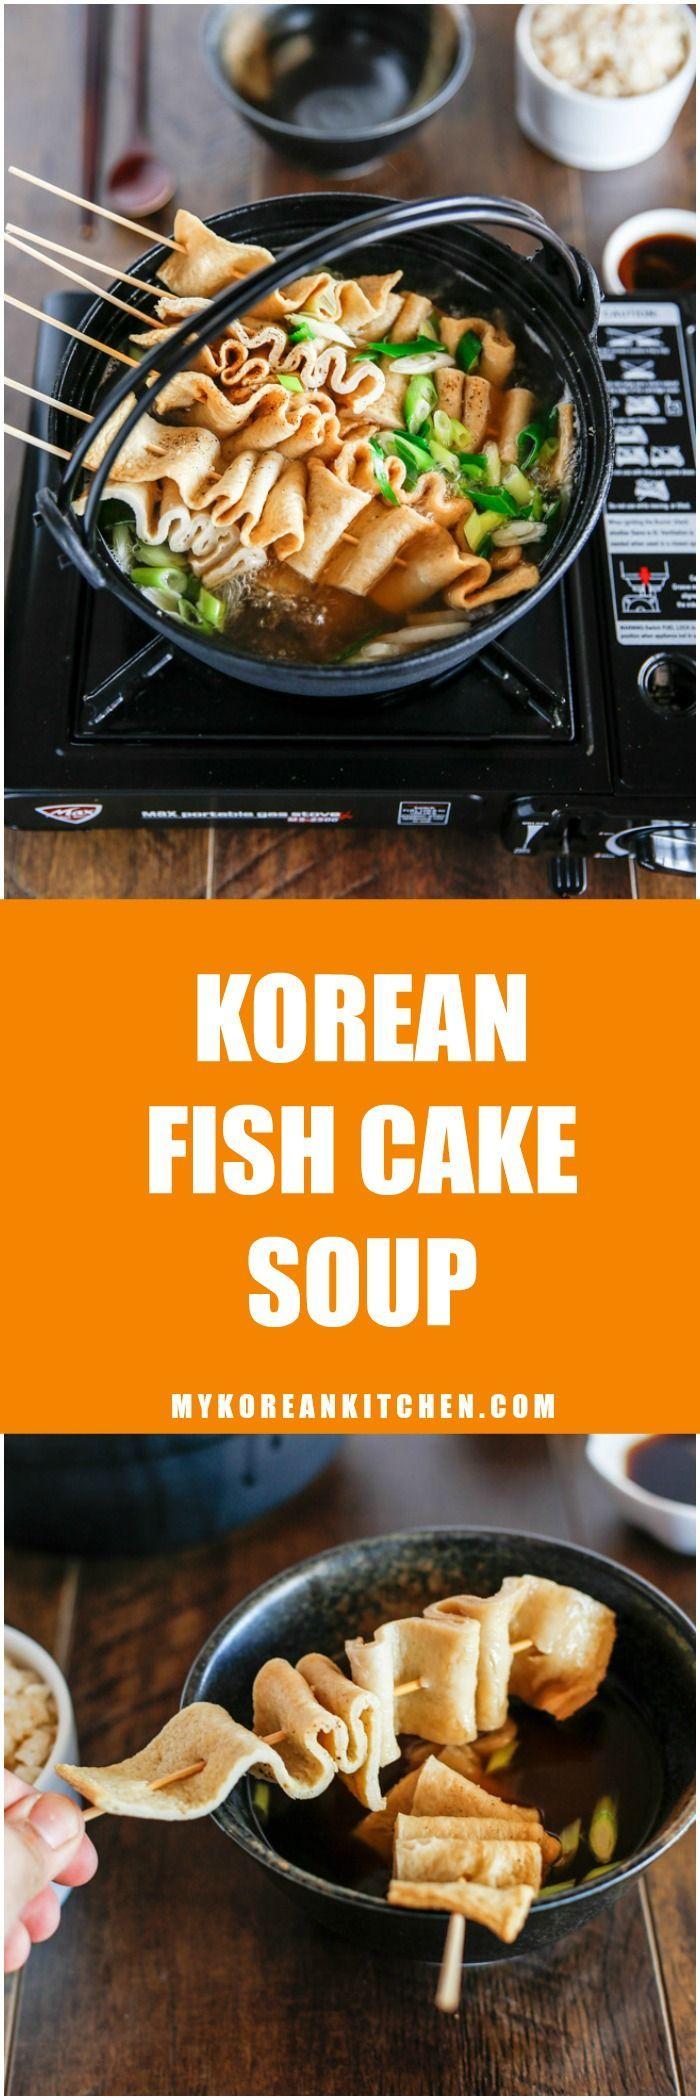 Korean Fish Cake Soup | MyKoreanKitchen.com